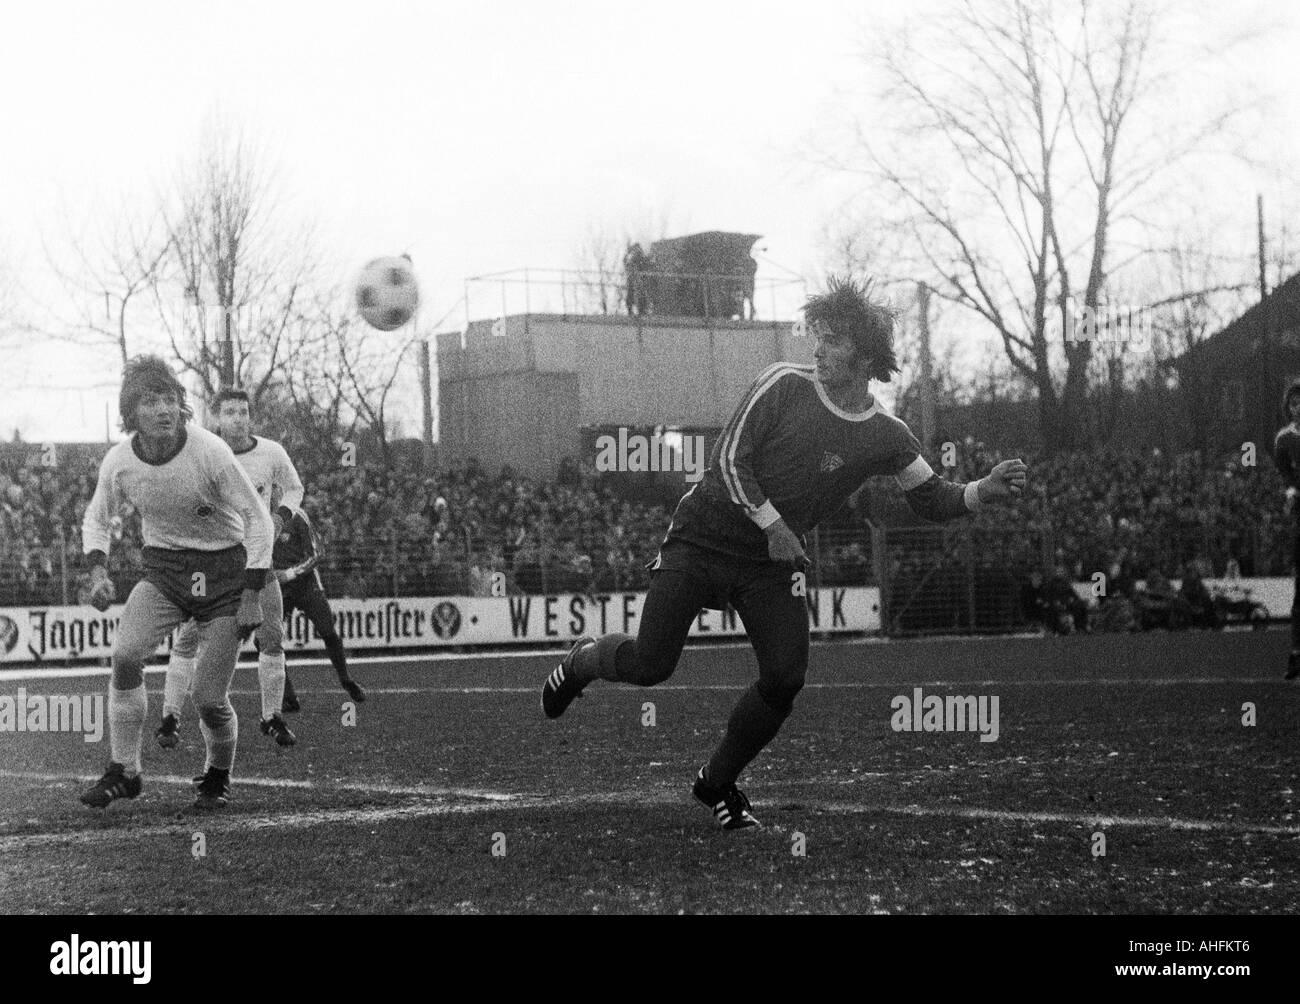 football, Bundesliga, 1971/1972, VfL Bochum versus Rot-Weiss Oberhausen 2:0, Stadium at the Castroper Strasse in Bochum, scene of the match, f.l.t.r. Gerd Woermer (RWO), Ludwig Denz (RWO), Hans Walitza (Bochum) - Stock Image